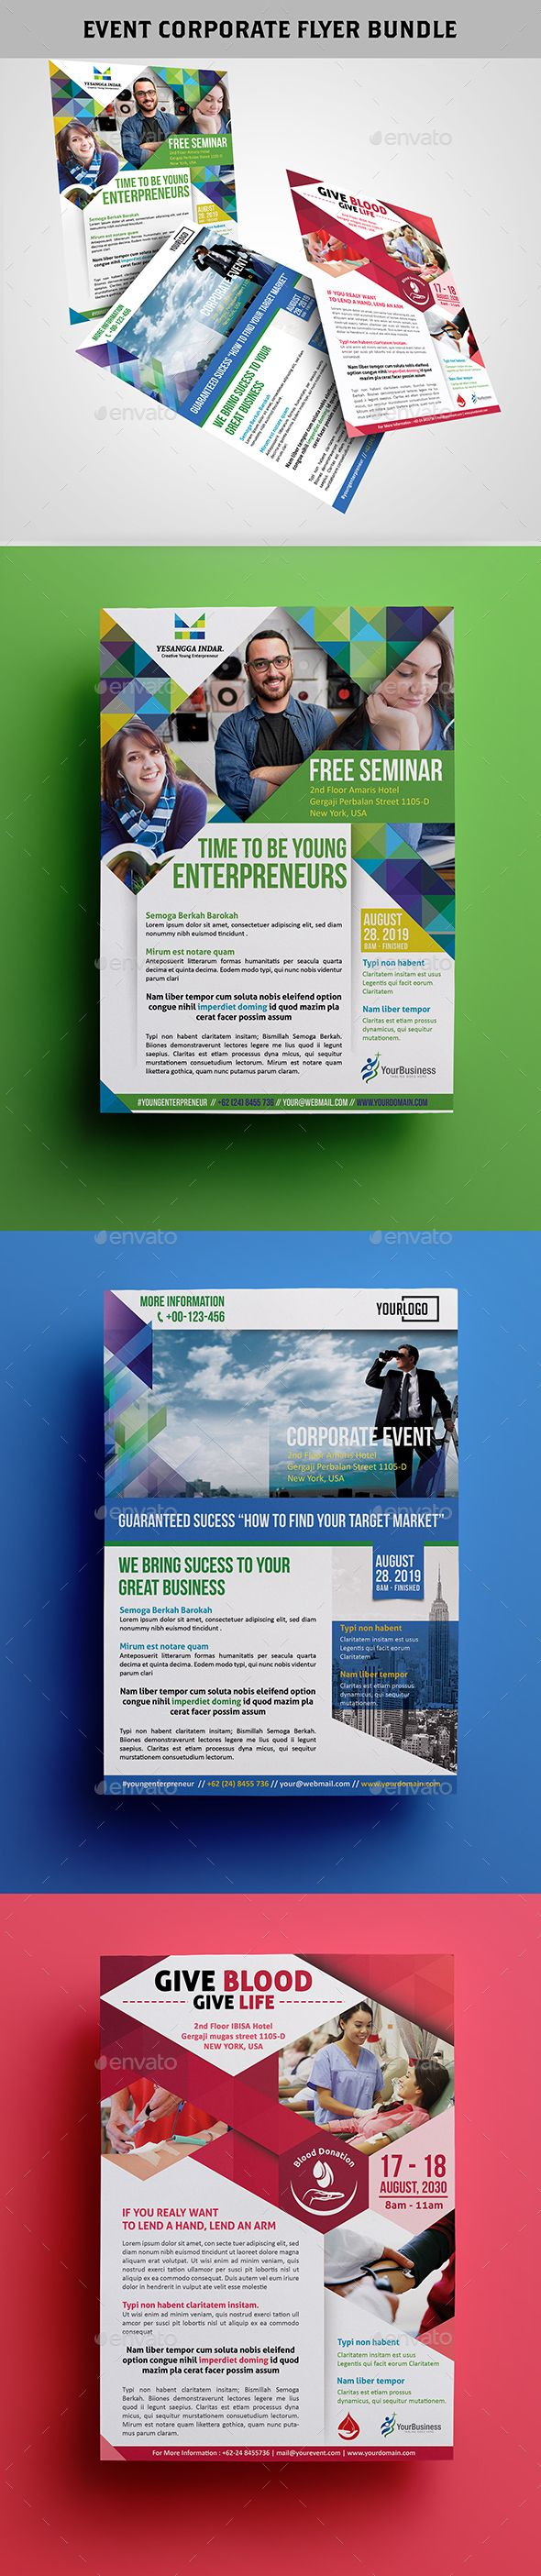 Event Corporate Flyer Bundle Templates PSD #design Download: http://graphicriver.net/item/event-corporate-flyer-bundle/13058039?ref=ksioks